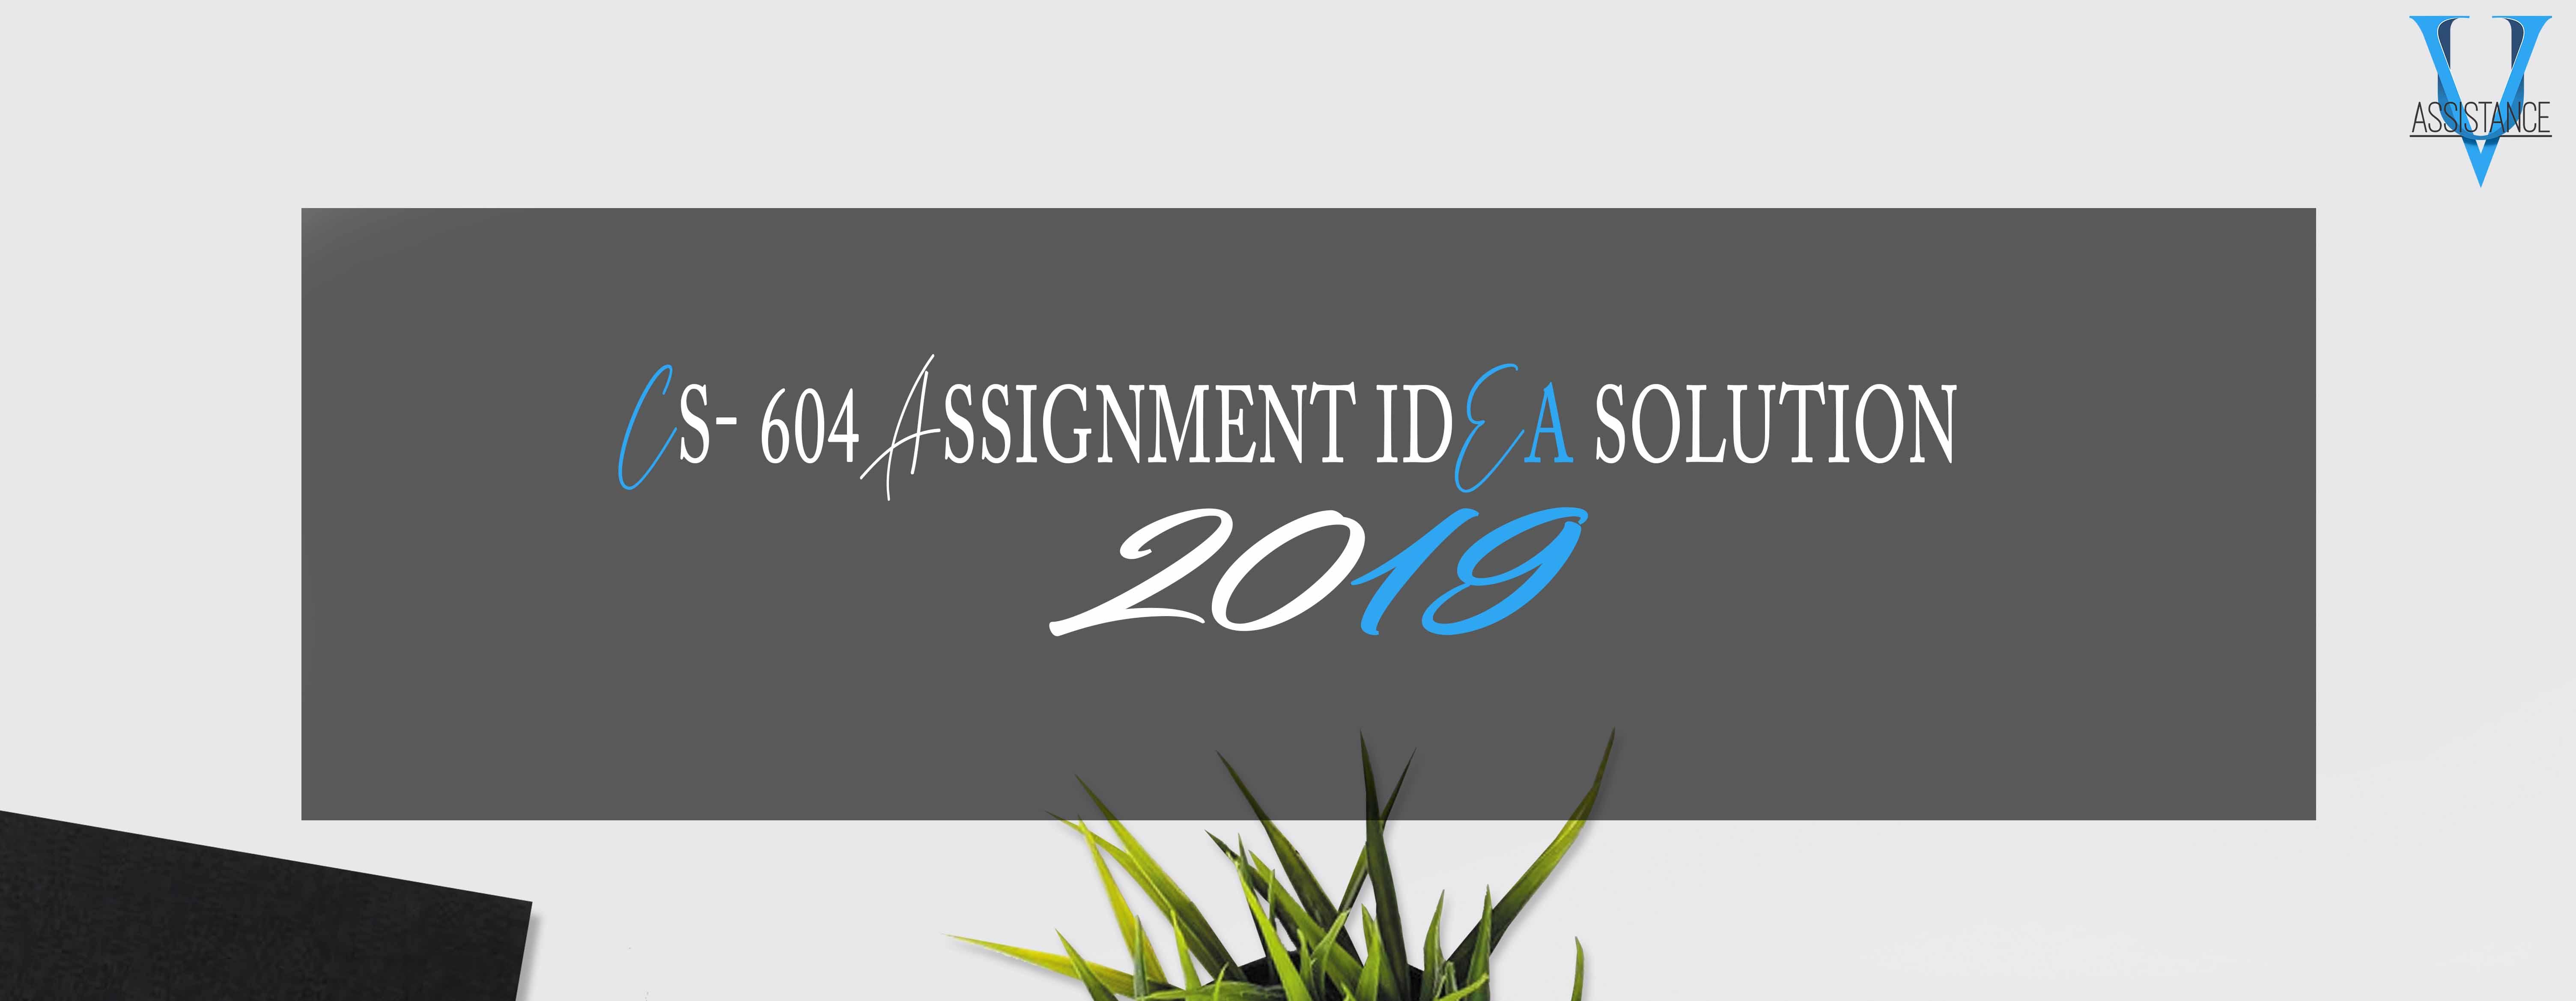 CS604 Assignment 1 Solution 2019